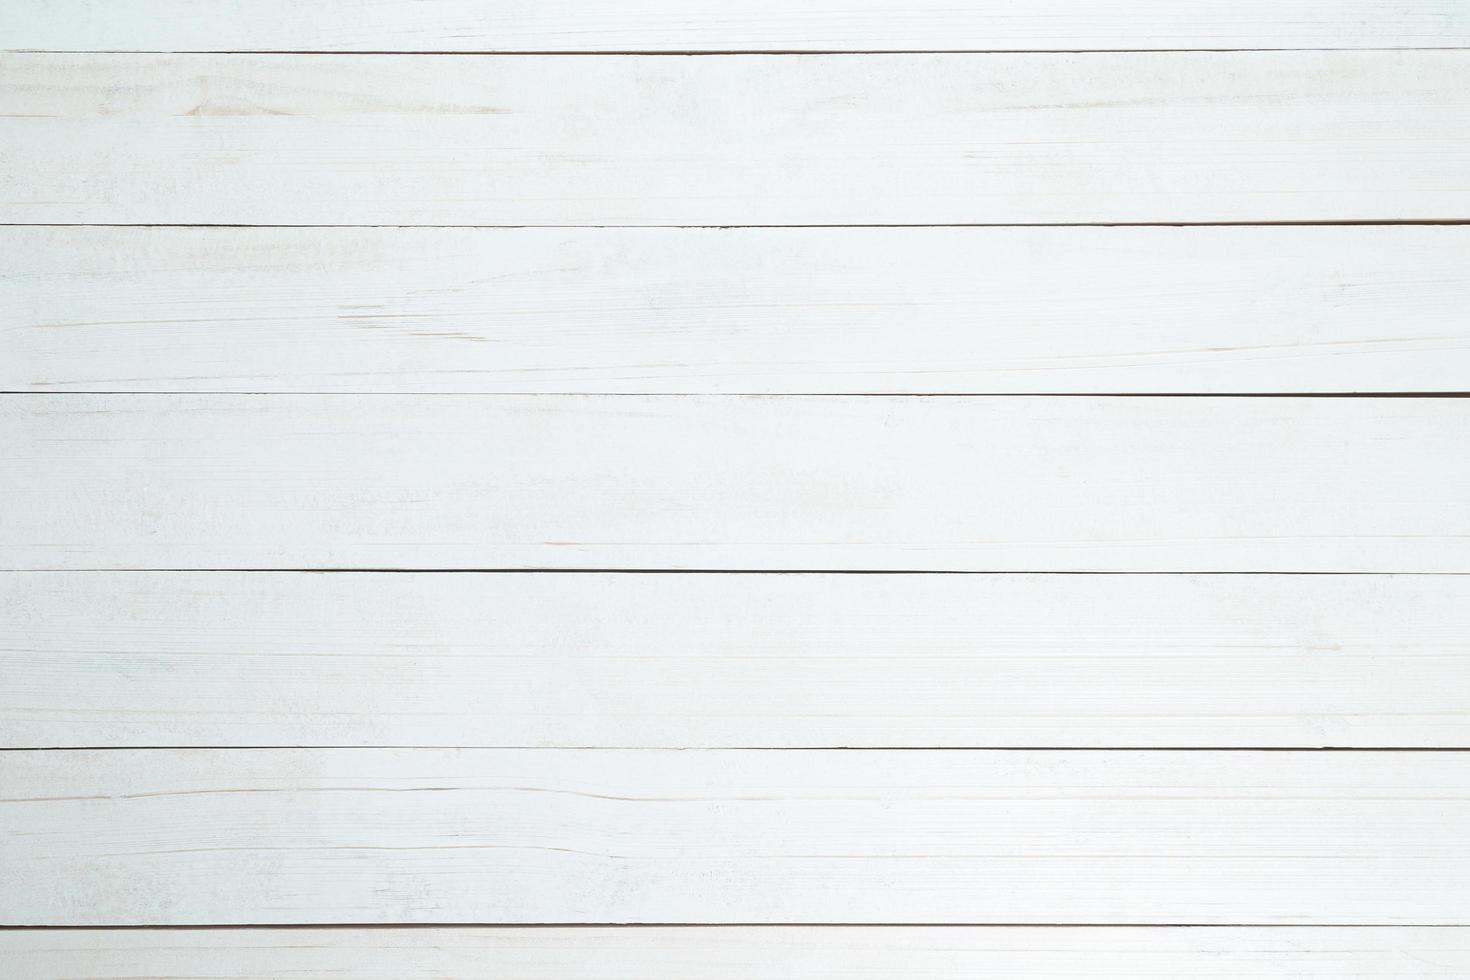 White wooden texture background photo